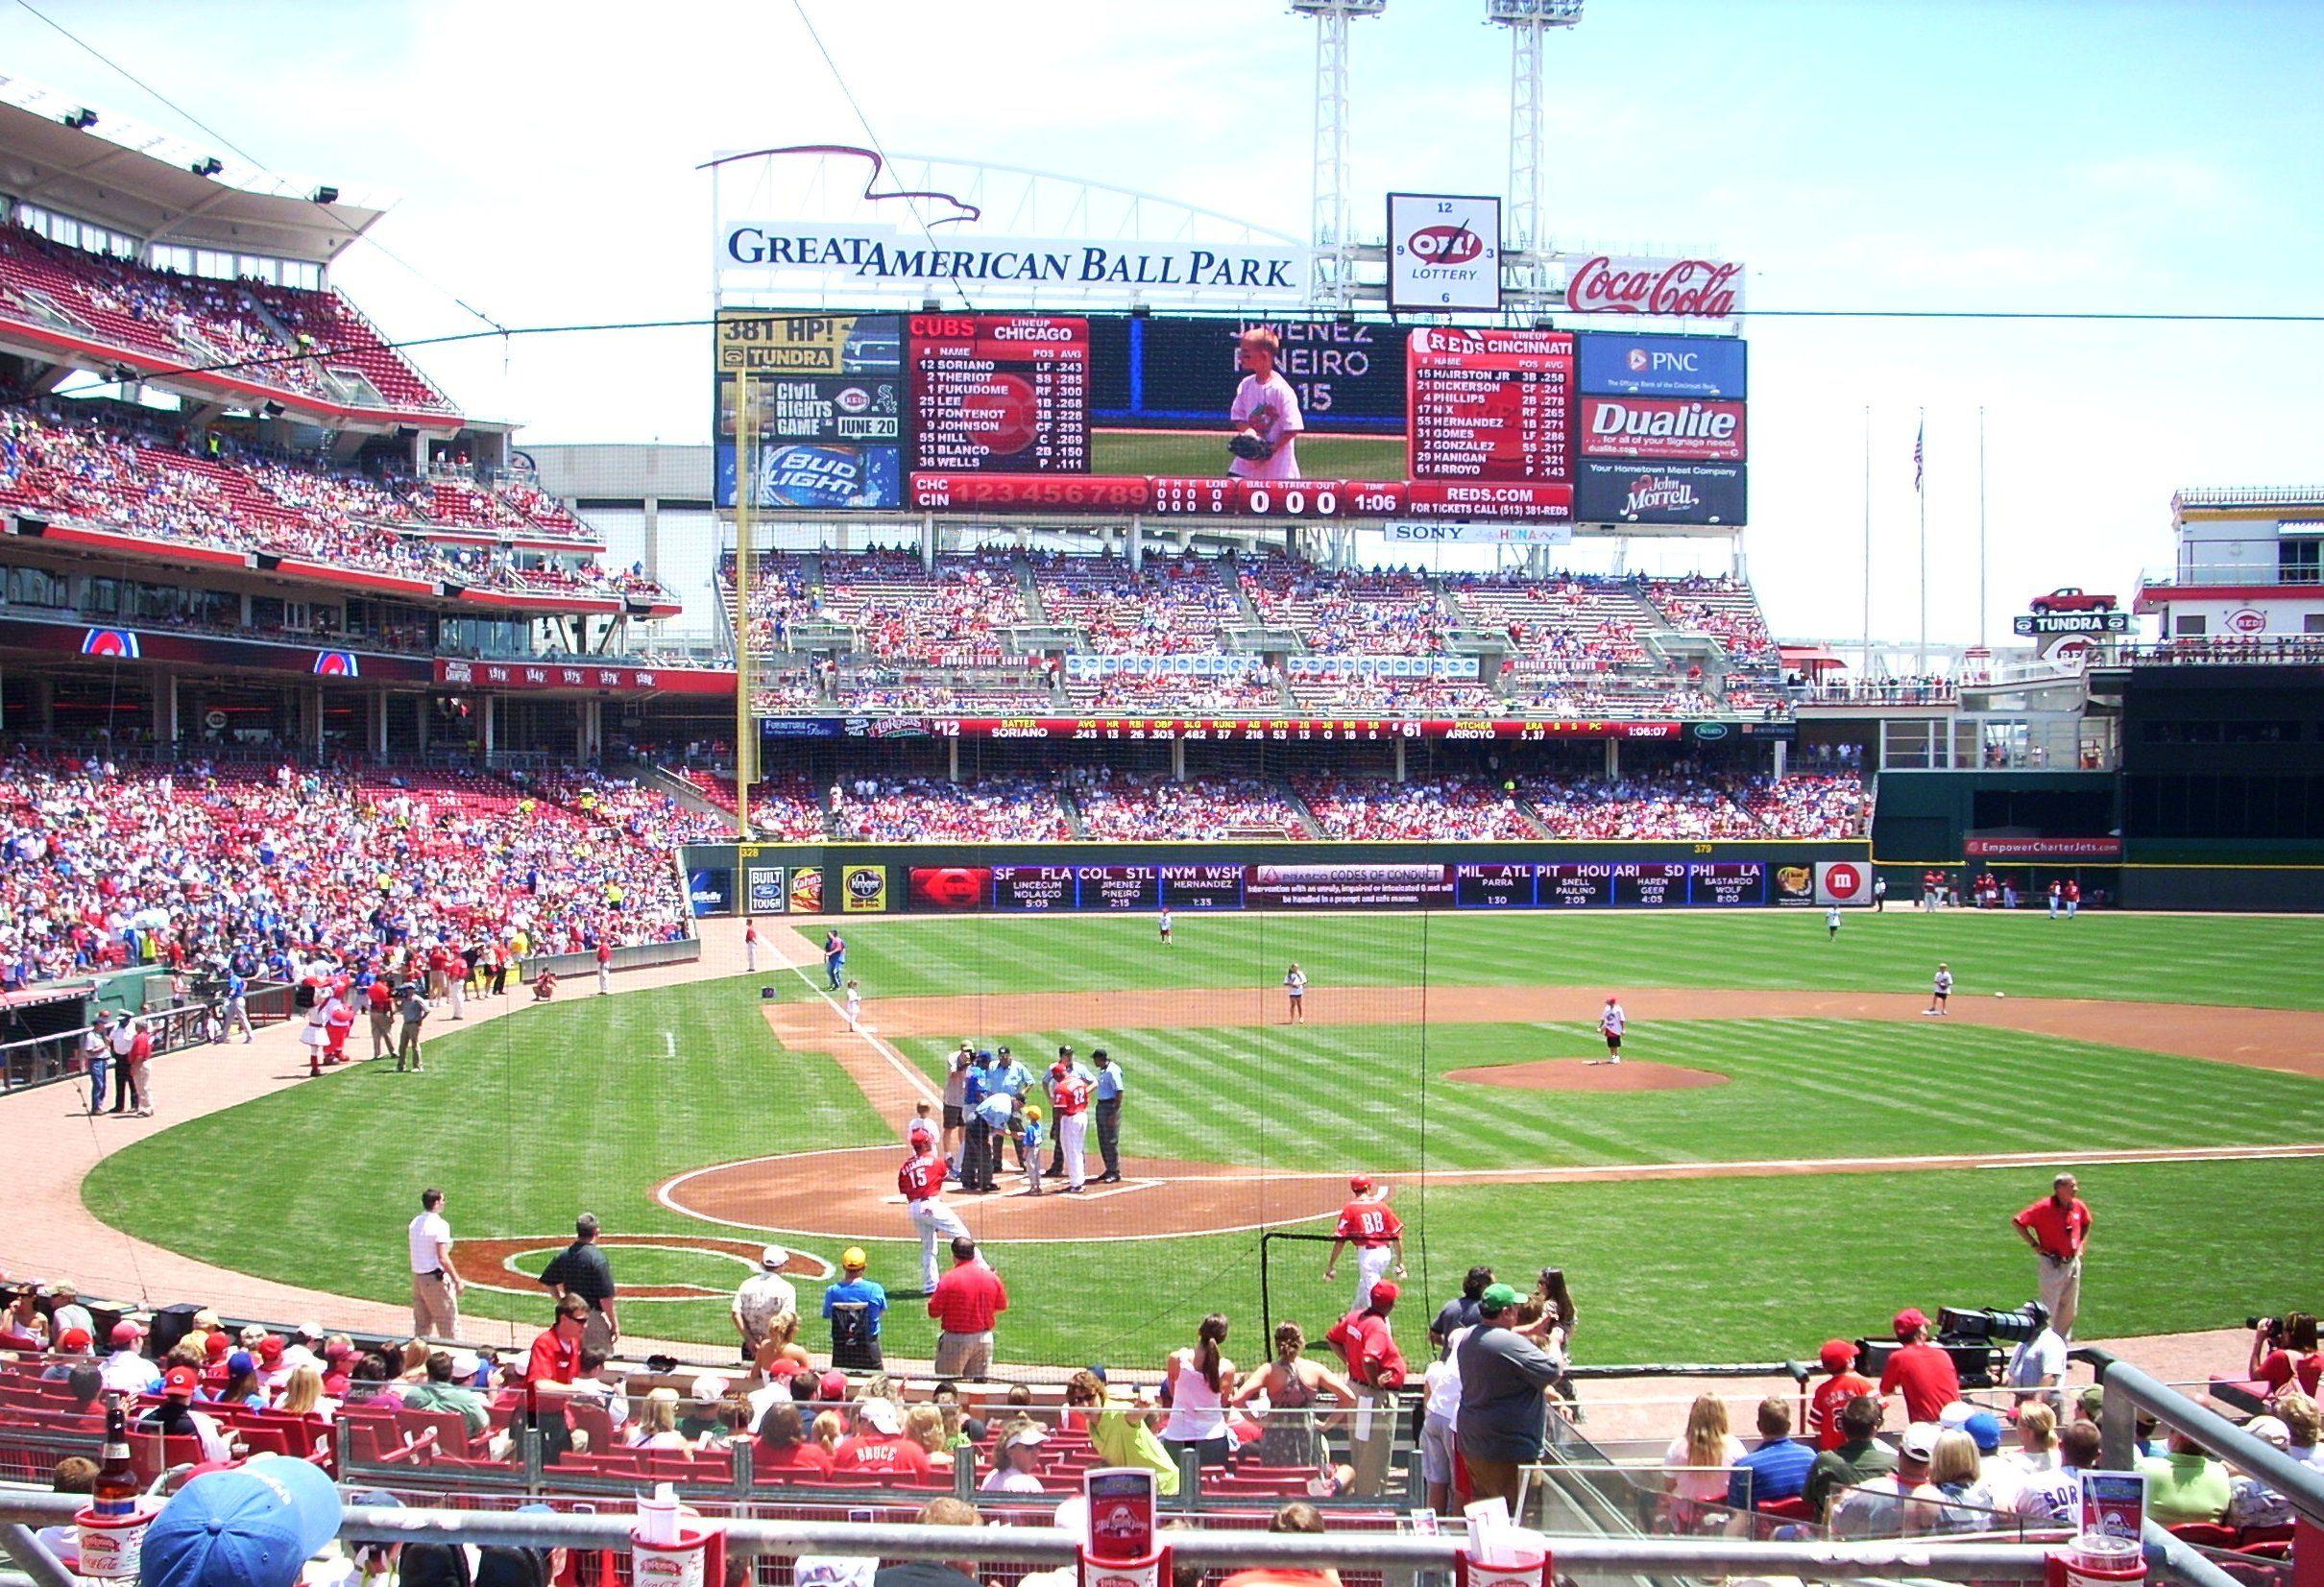 Great American Ballpark Cincinnati Oh Behind Home Plate Major League Baseball Stadiums Ballparks Baseball Stadium